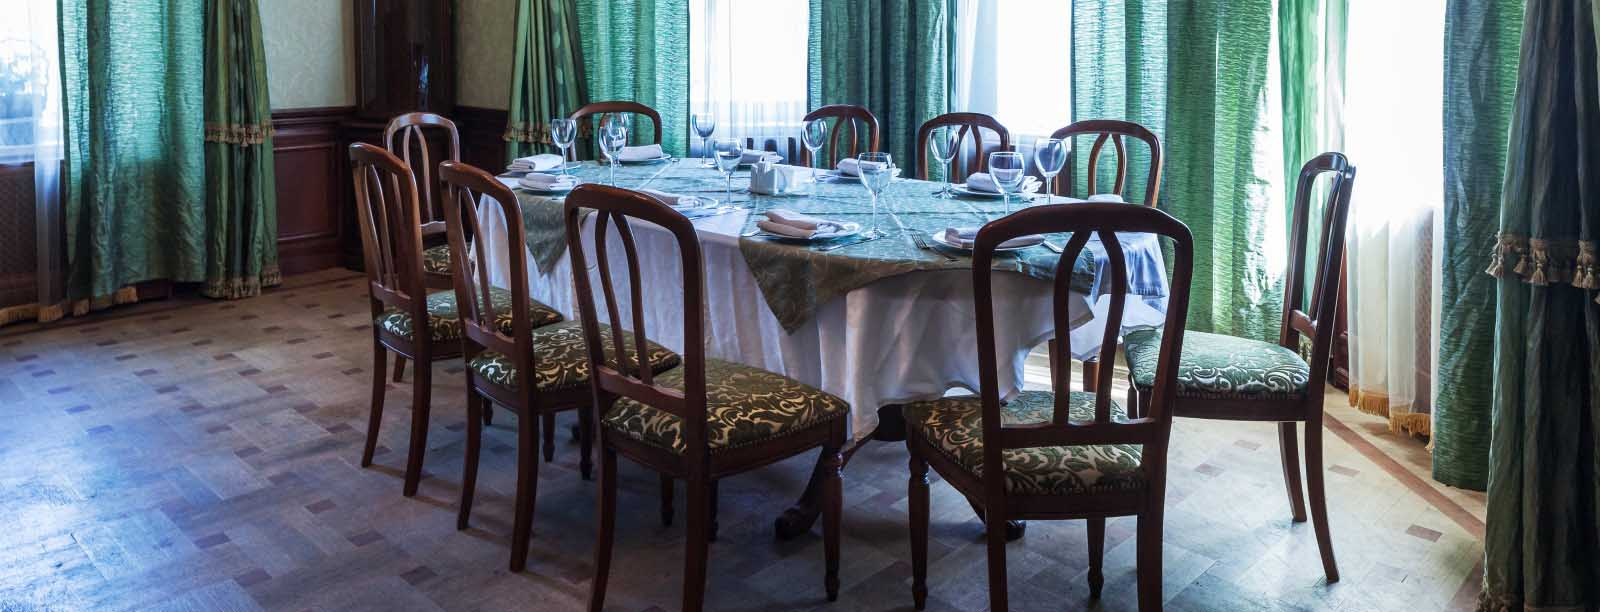 Ресторан #proСчастье